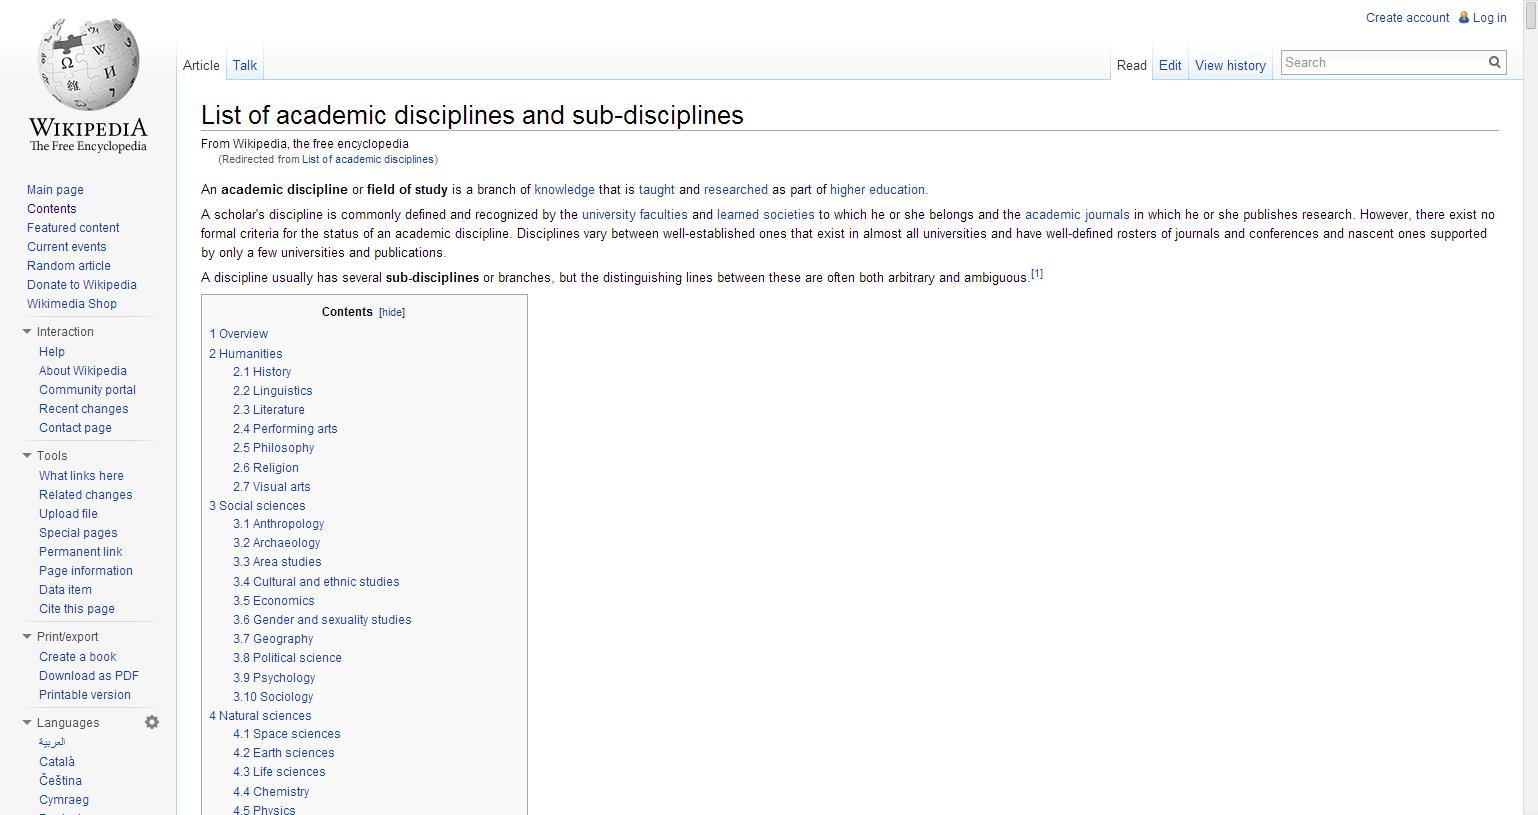 List of academic disciplines and sub-disciplines - Wikipedia